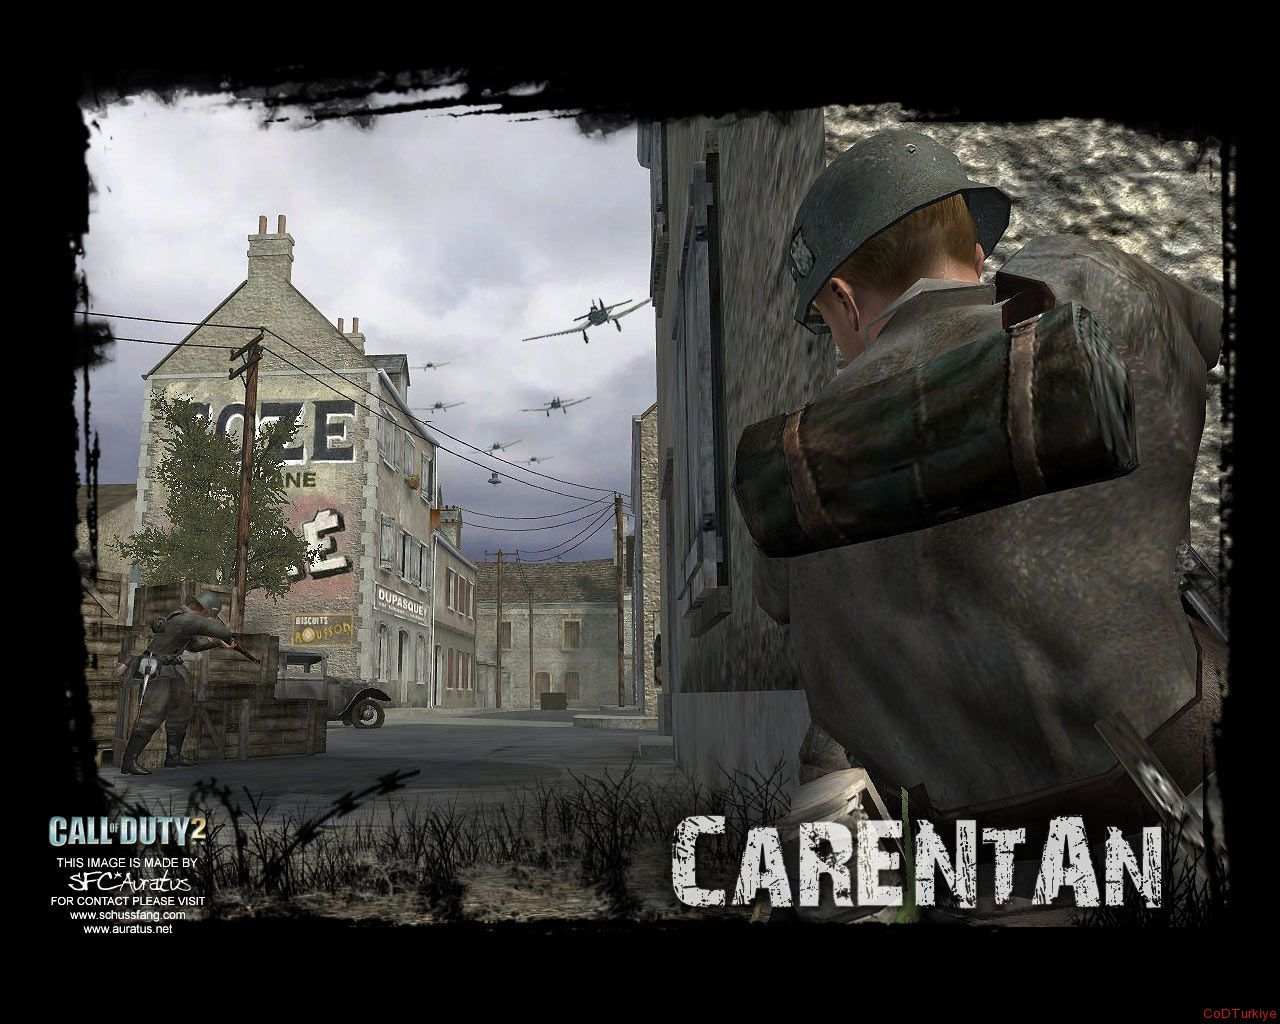 Call of Duty 2 Map Carentan